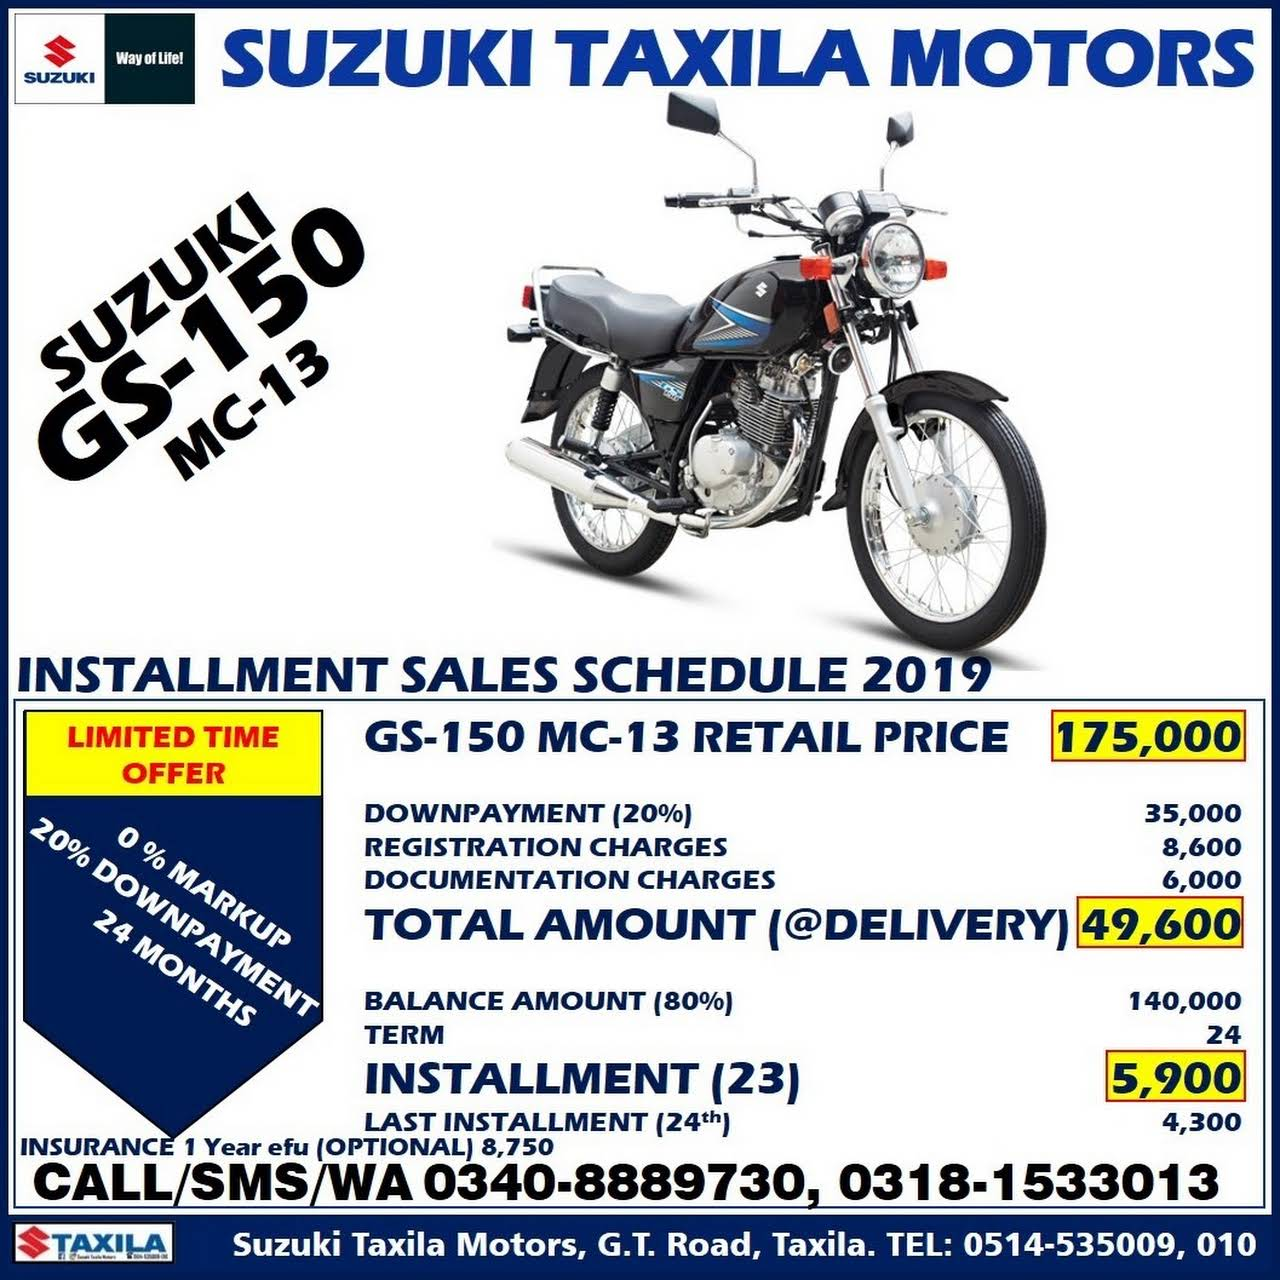 SUZUKI TAXILA MOTORS - 7S Authorized Dealership in Taxila